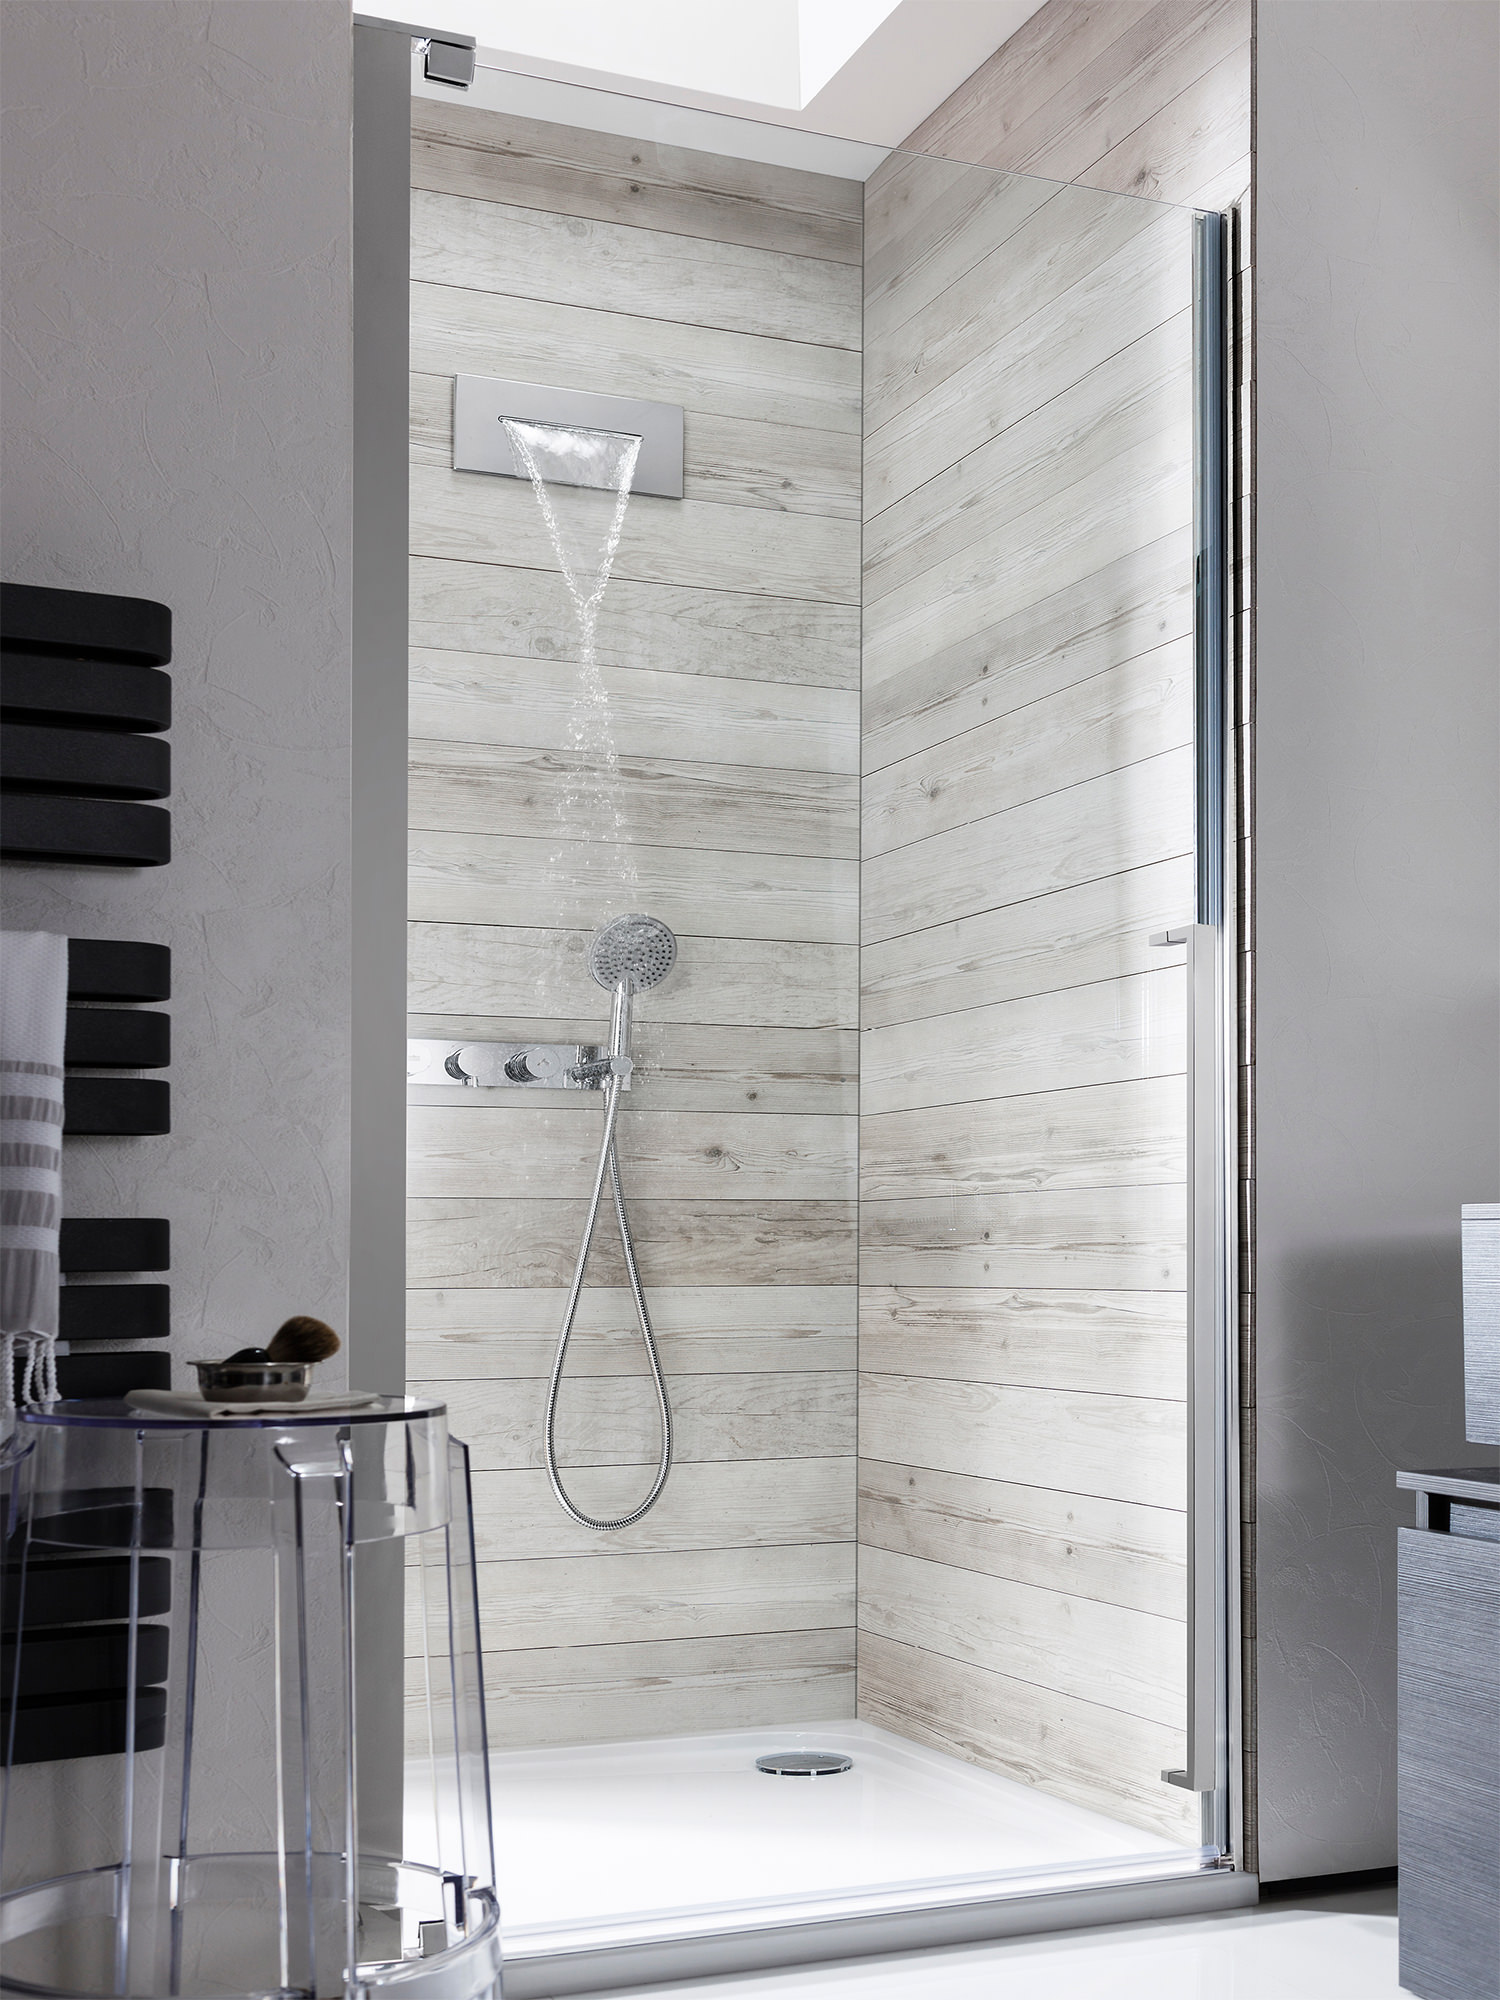 Crosswater Zest Shower Bath Waterfall Filler Tap Zt0370wc